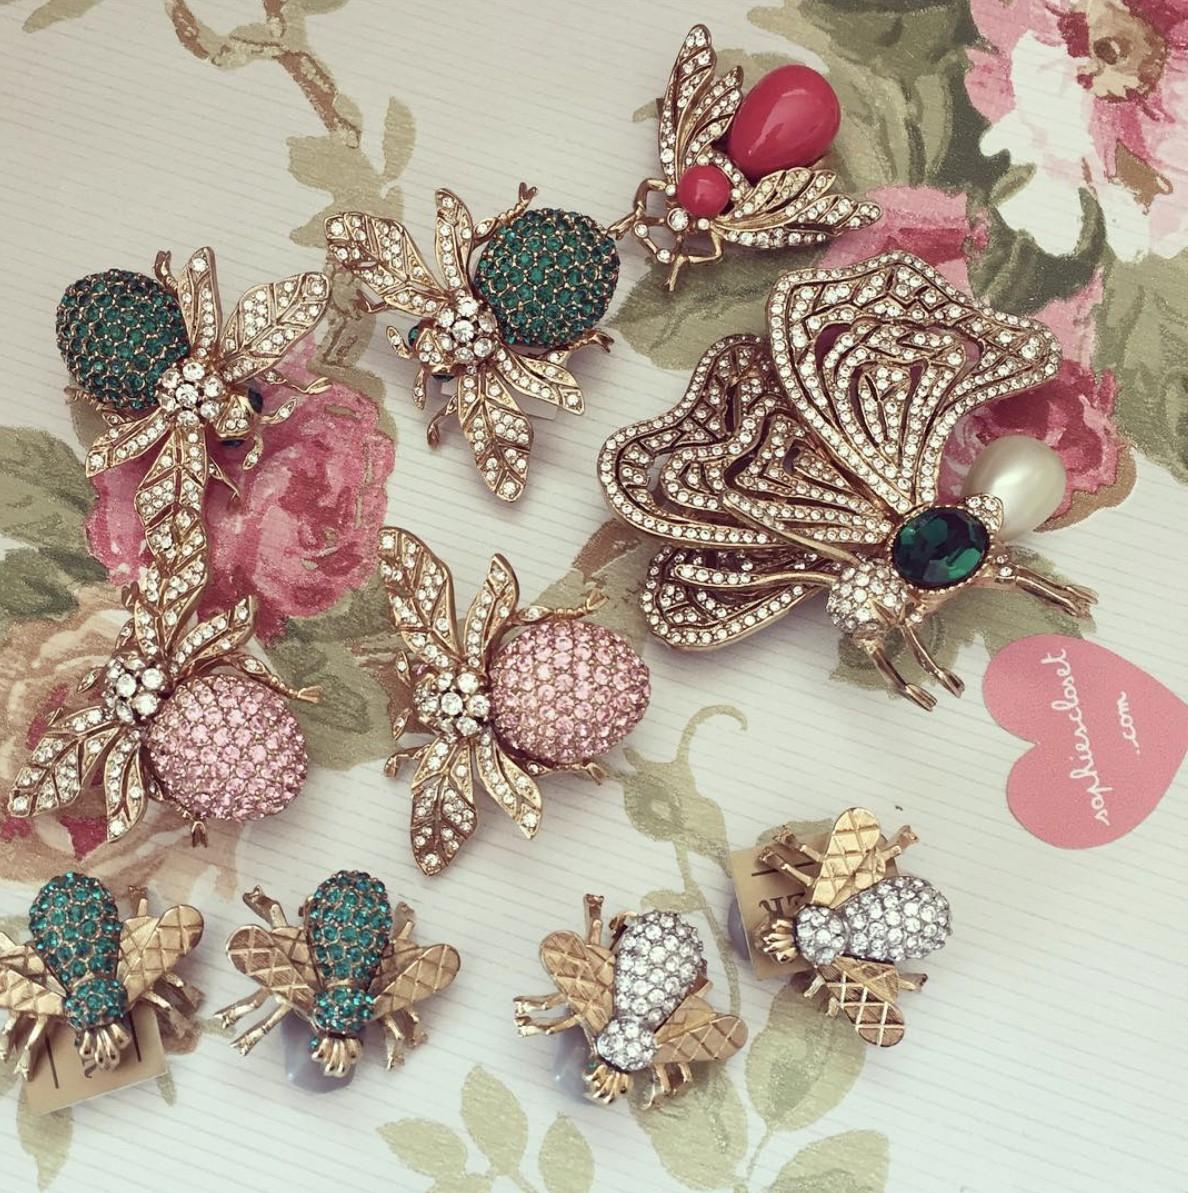 Where to Buy Costume Jewelry in Dubai - Savoir Flair